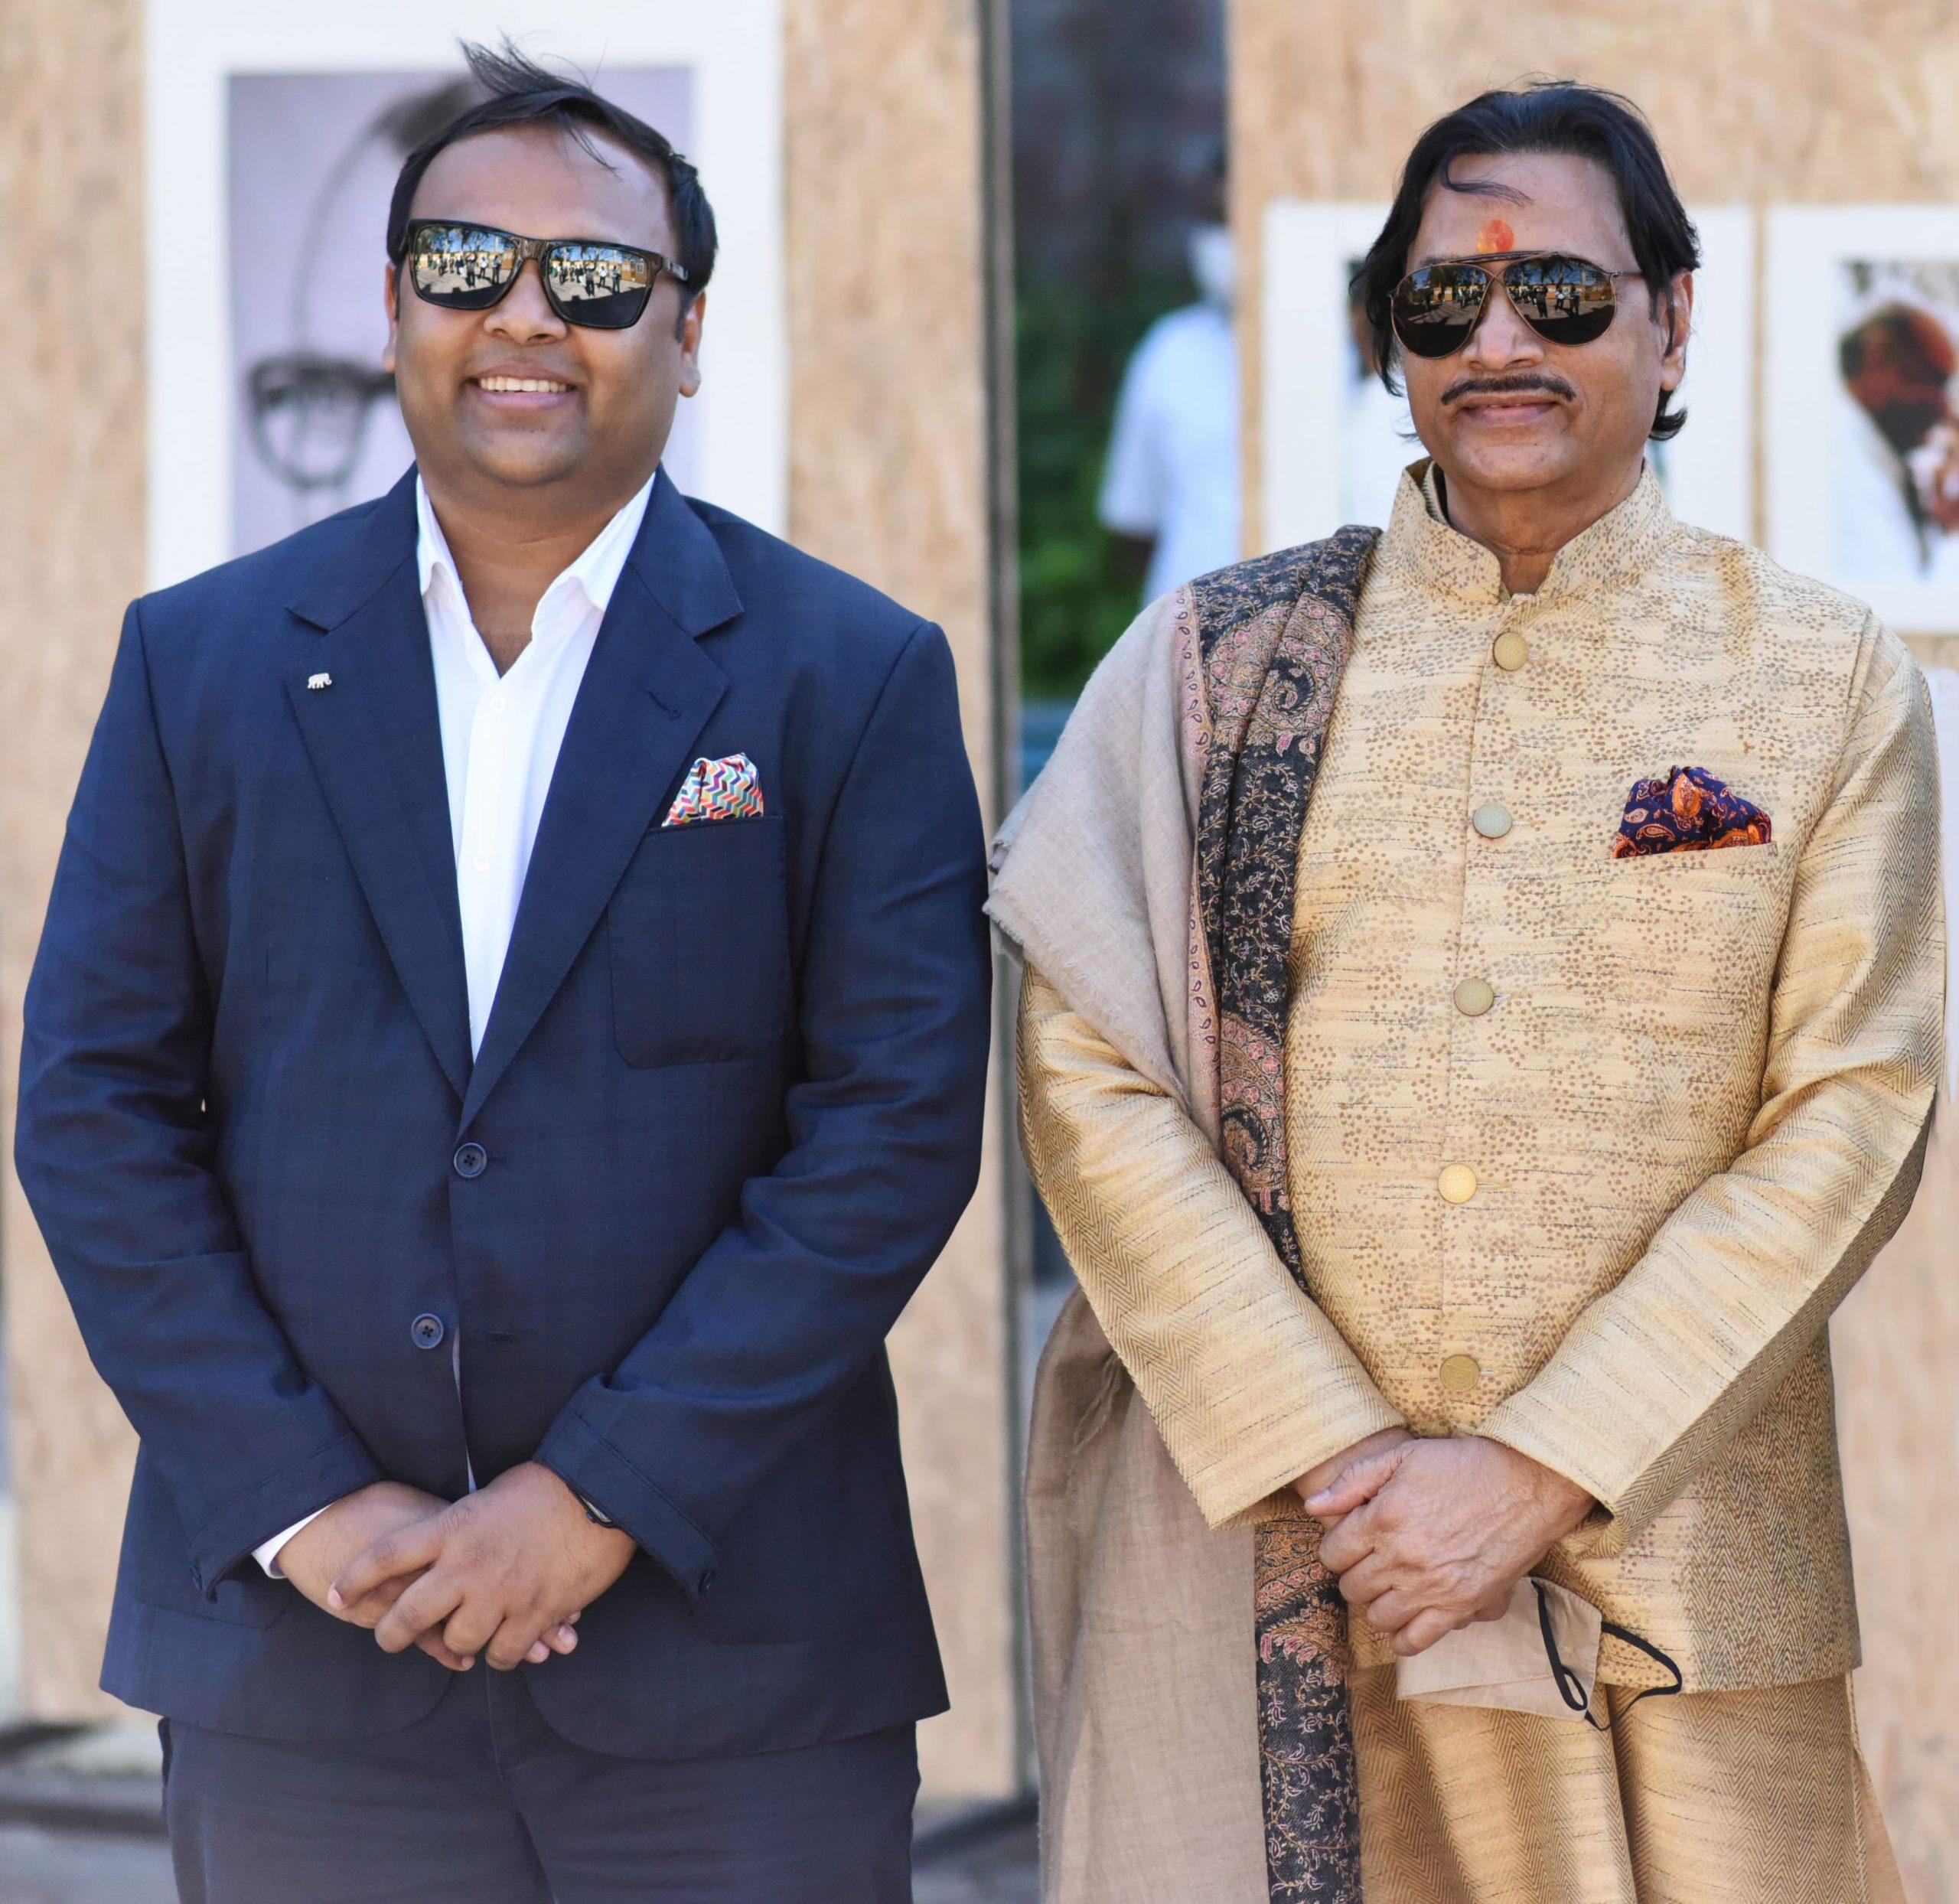 Mr.-Abhishek-Mohan-Gupta-Pro-Chancellor-Jagran-Lakecity-University-Bhopal-and-Shri.-Hari-Mohan-Gupta-Chancellor-Jagran-Lakecity-University-Bhopal